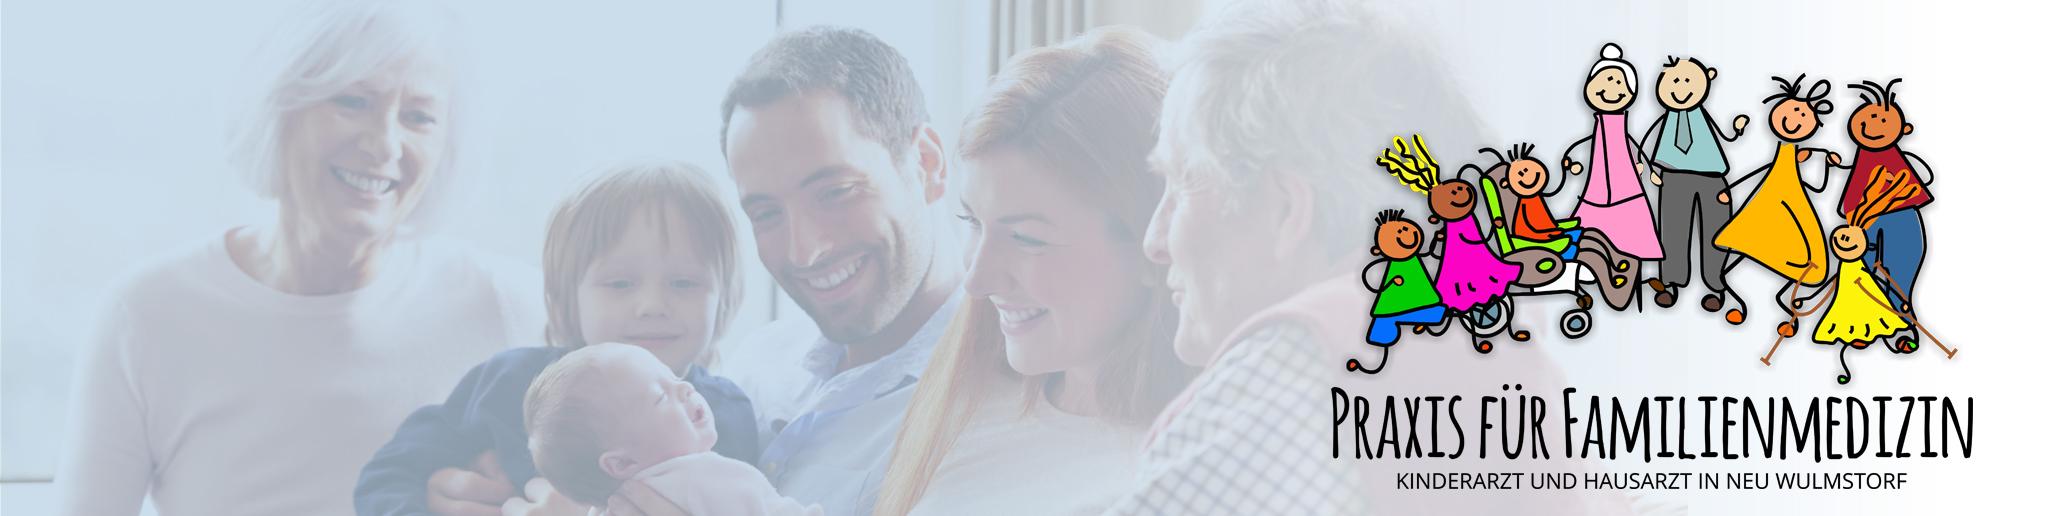 Praxis für Familienmedizin